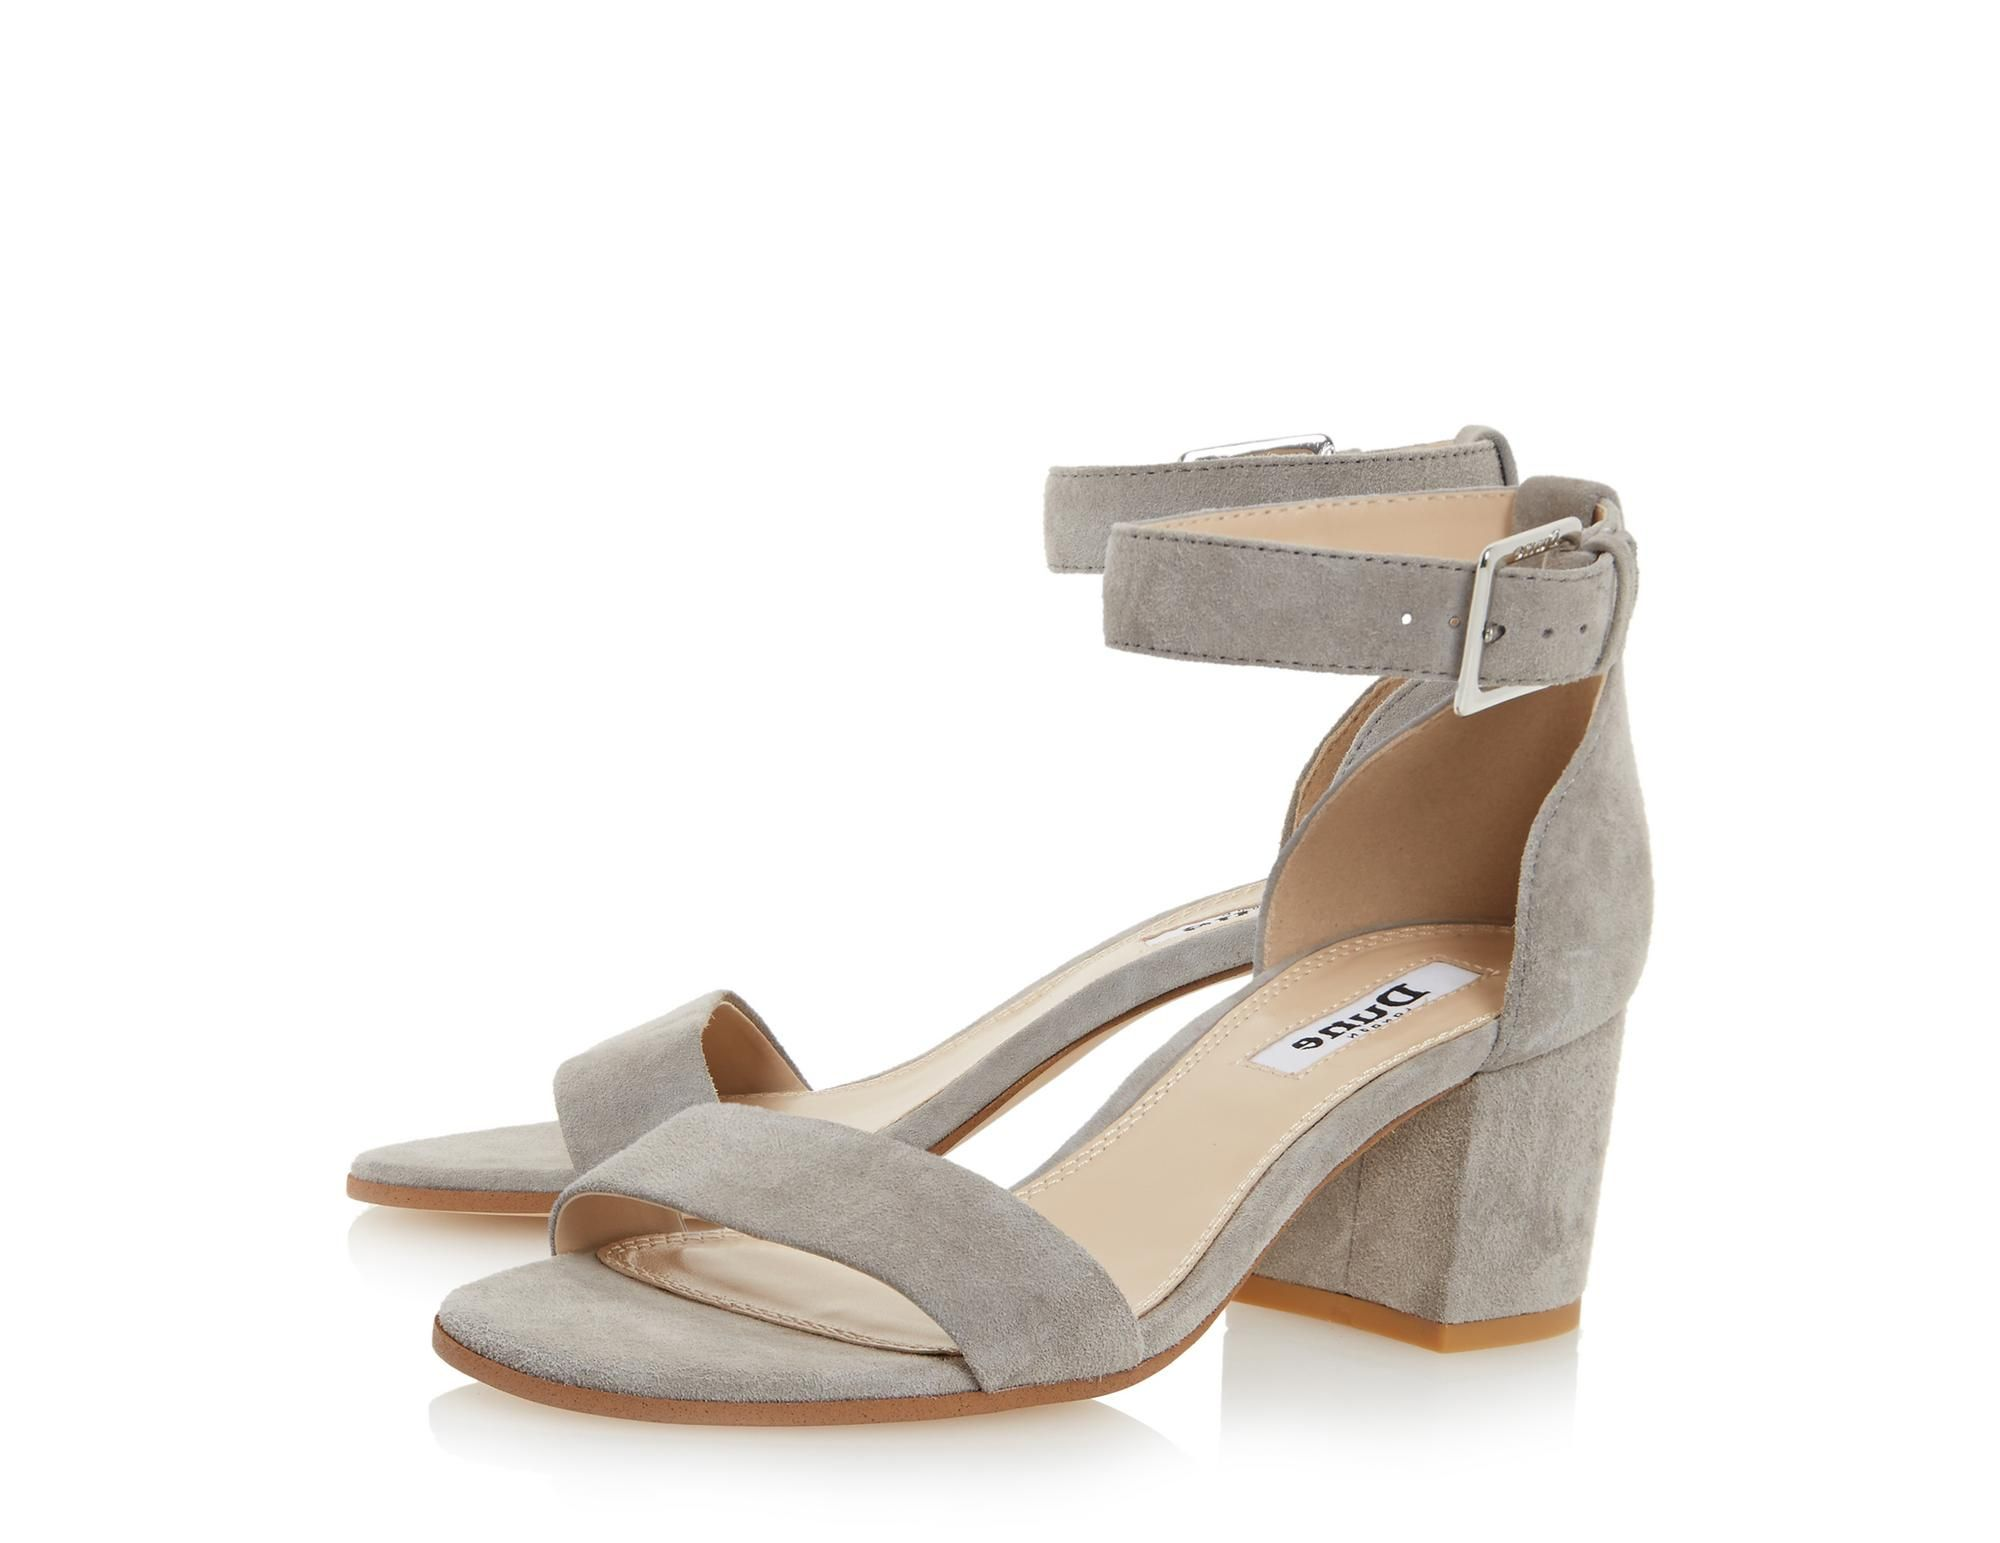 0b835102bb91 DUNE LADIES JAYGO - Two Part Block Heel Sandal - grey